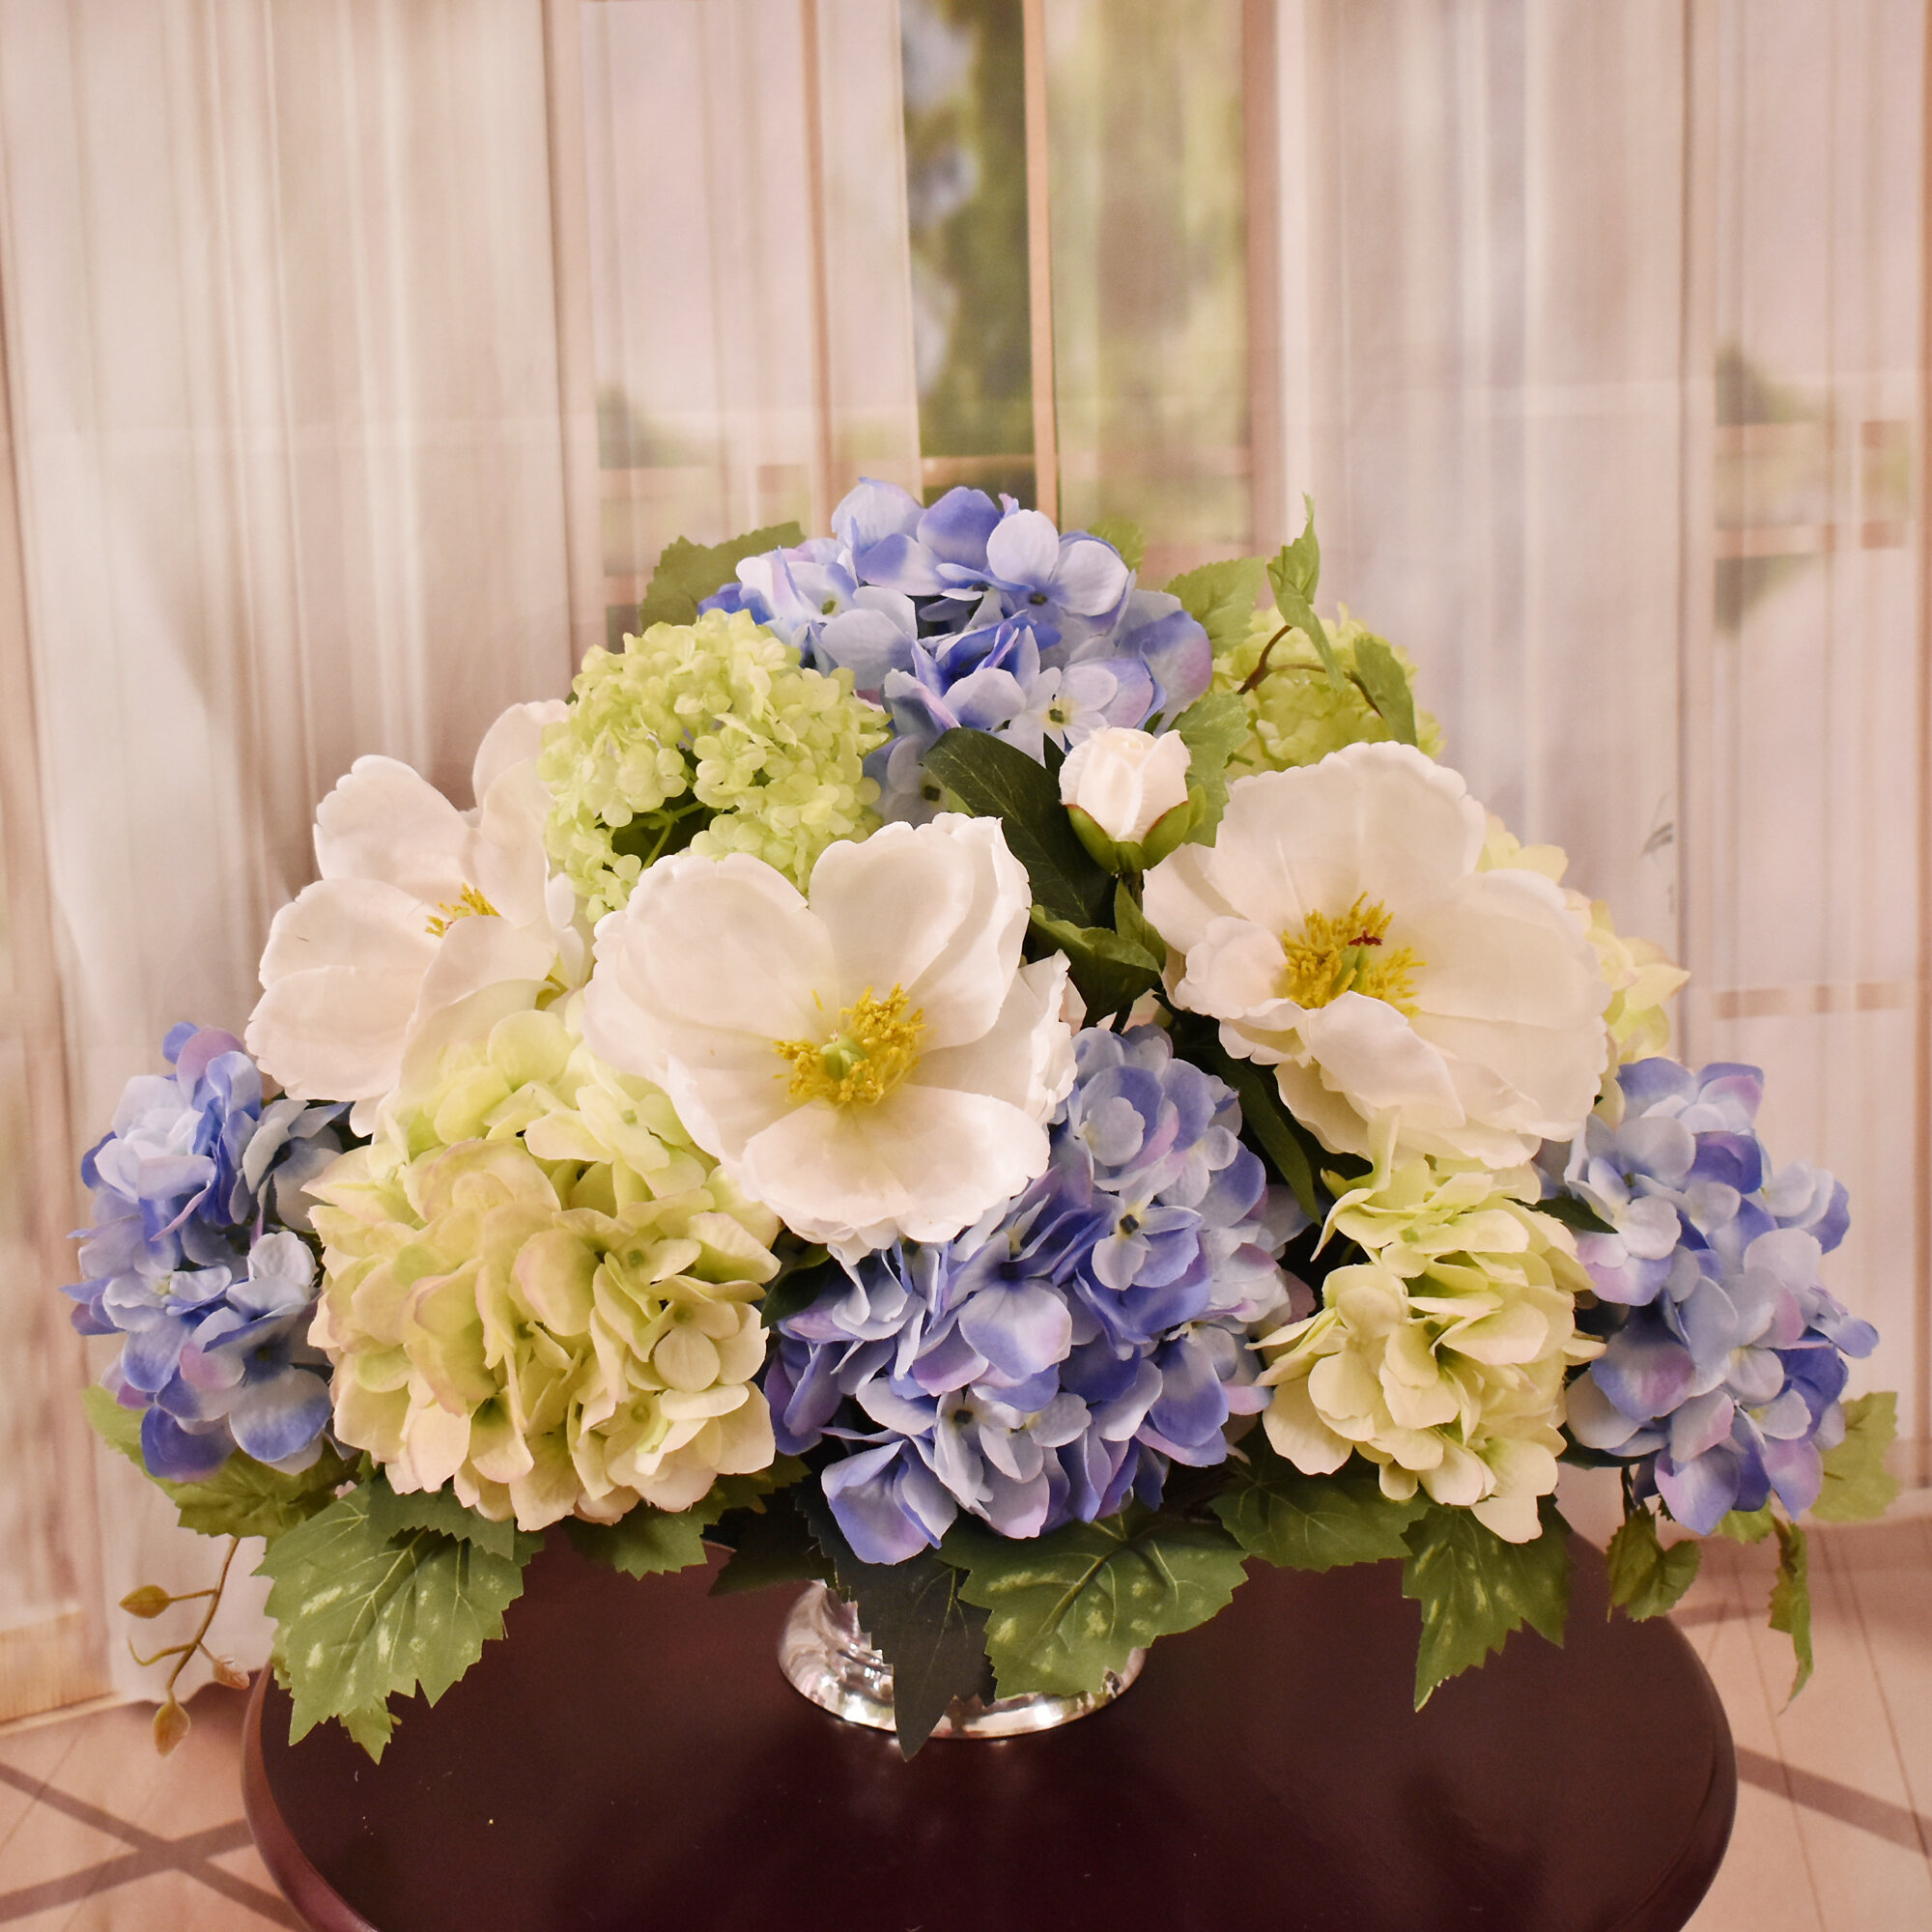 Rosdorf Park Hydrangea And Magnolia Centerpiece In Vase Wayfair